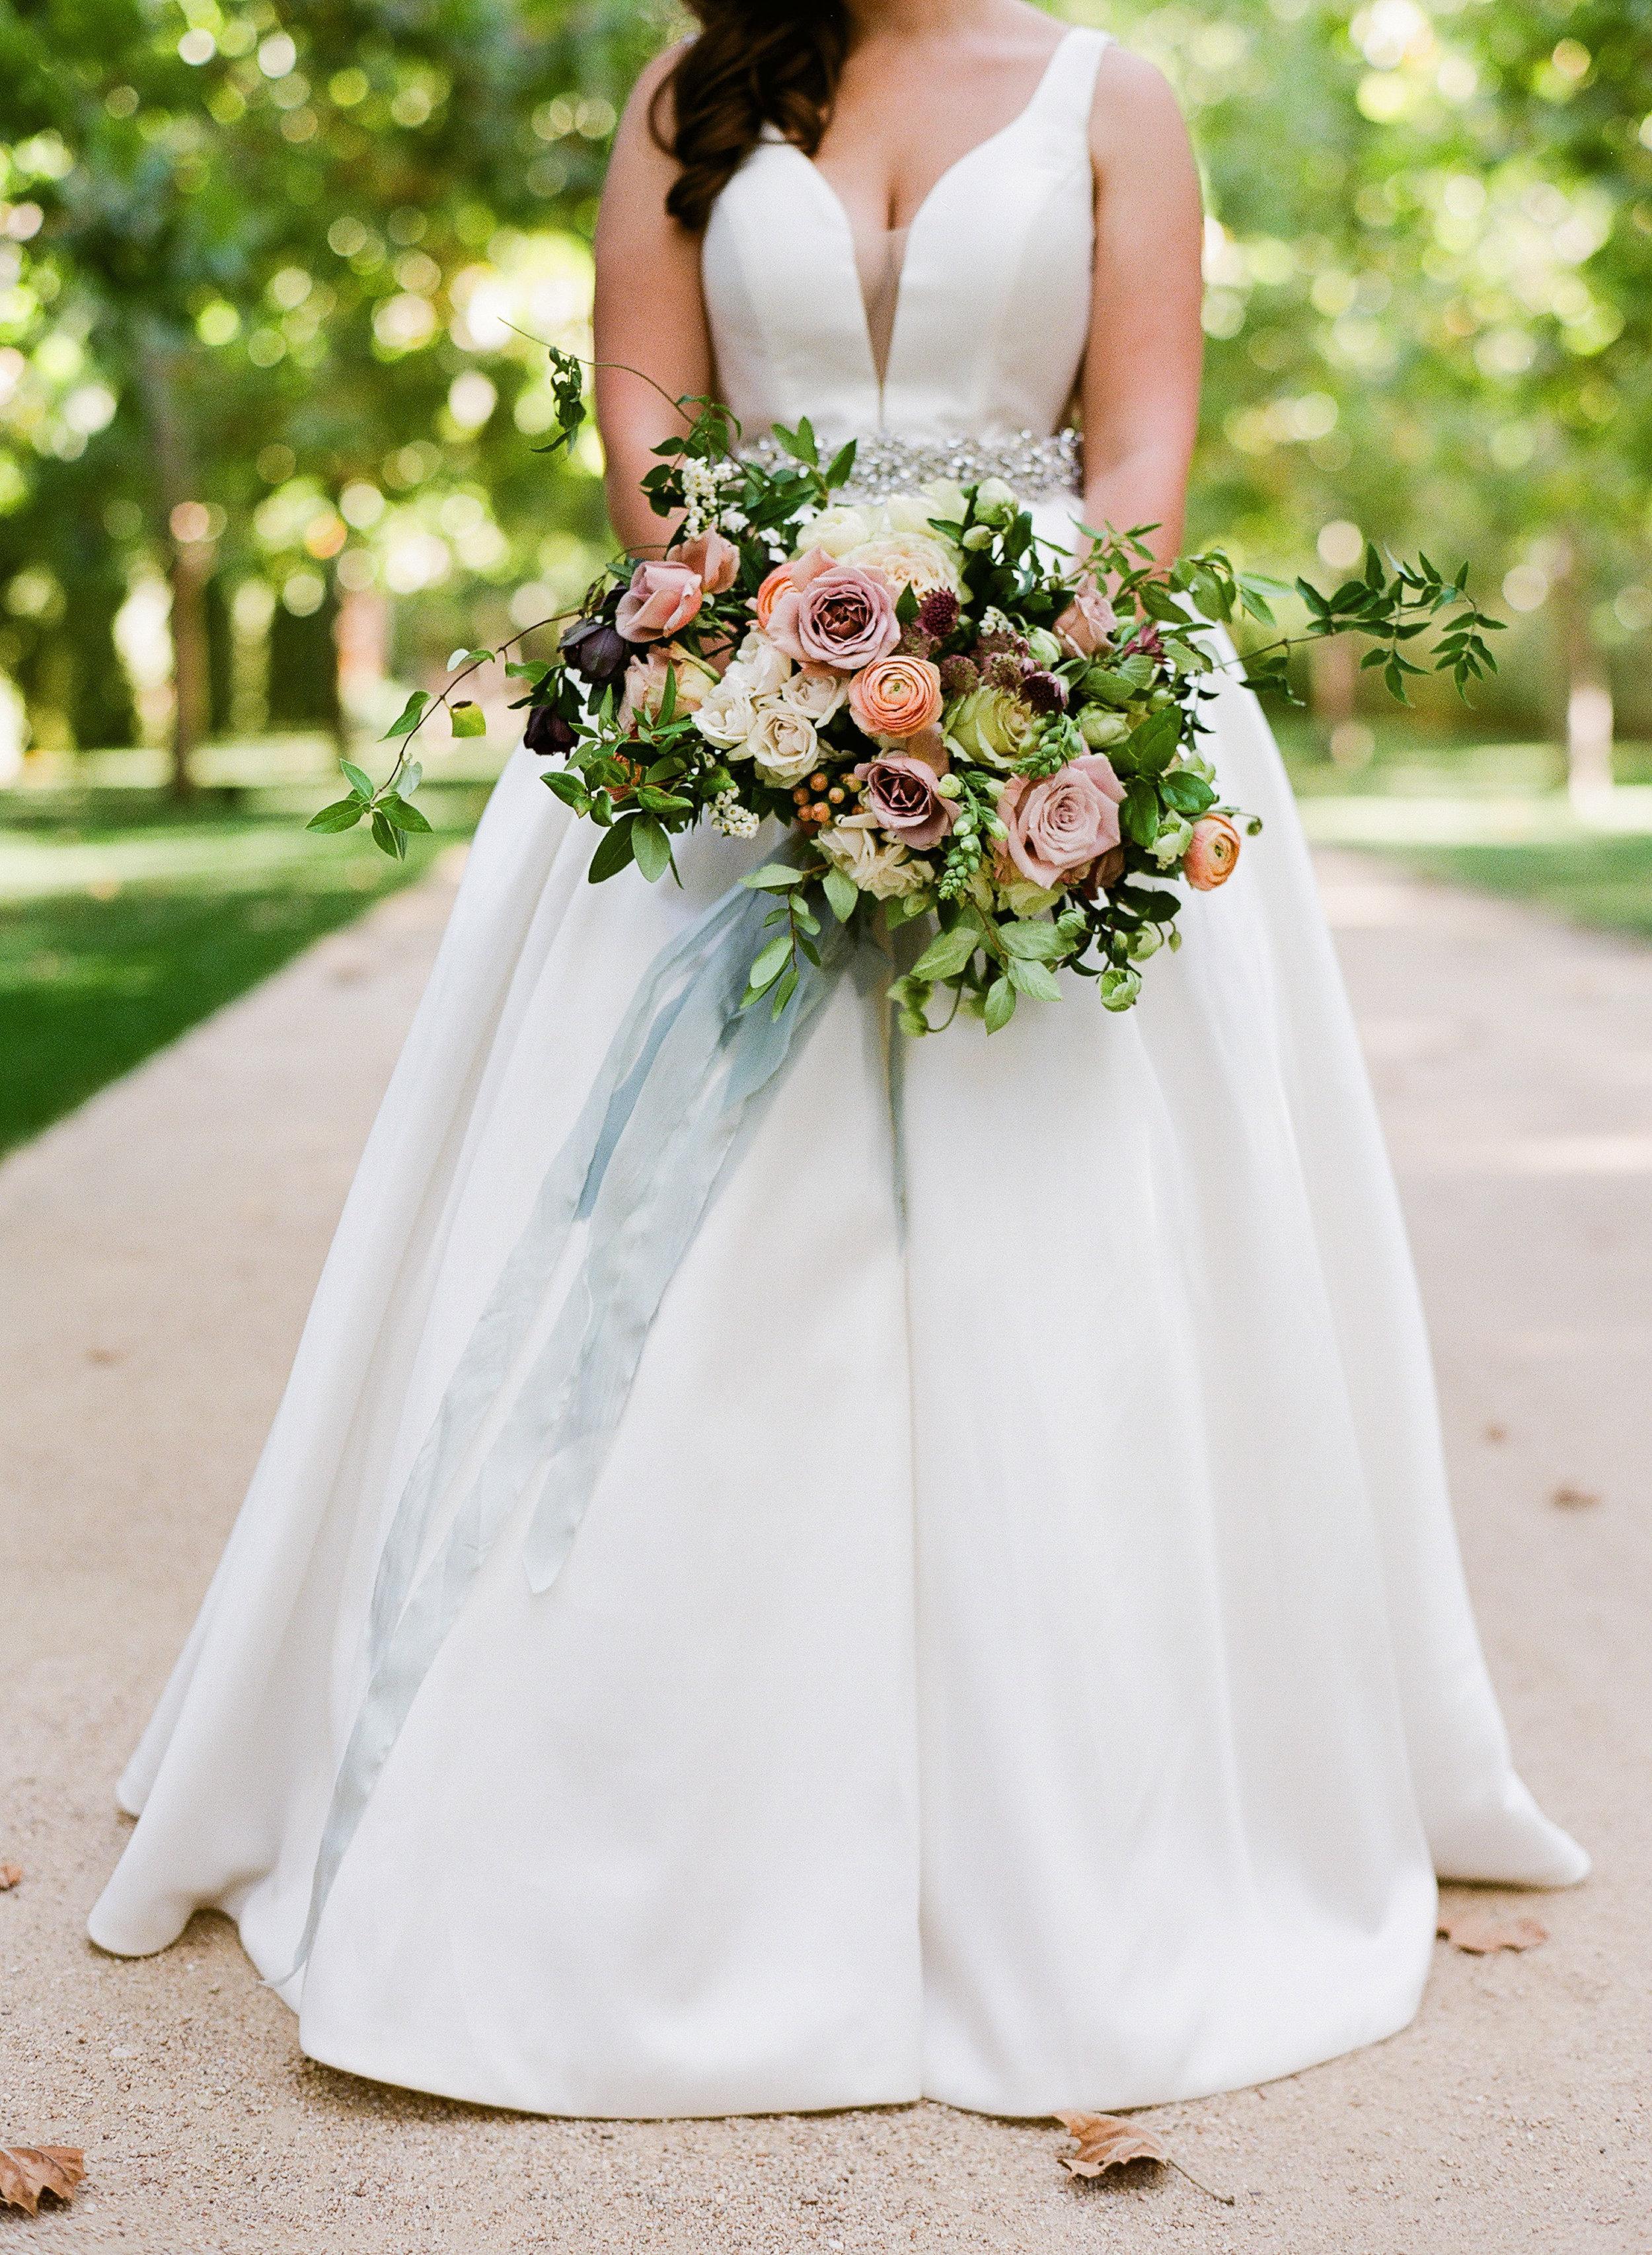 santa-barbara-elopement-elope-wedding-planner-planning-coordinator-day-of-intimate-event-design-kestrel-park-santa-ynez-english-country-estate-garden-castle (7).jpg